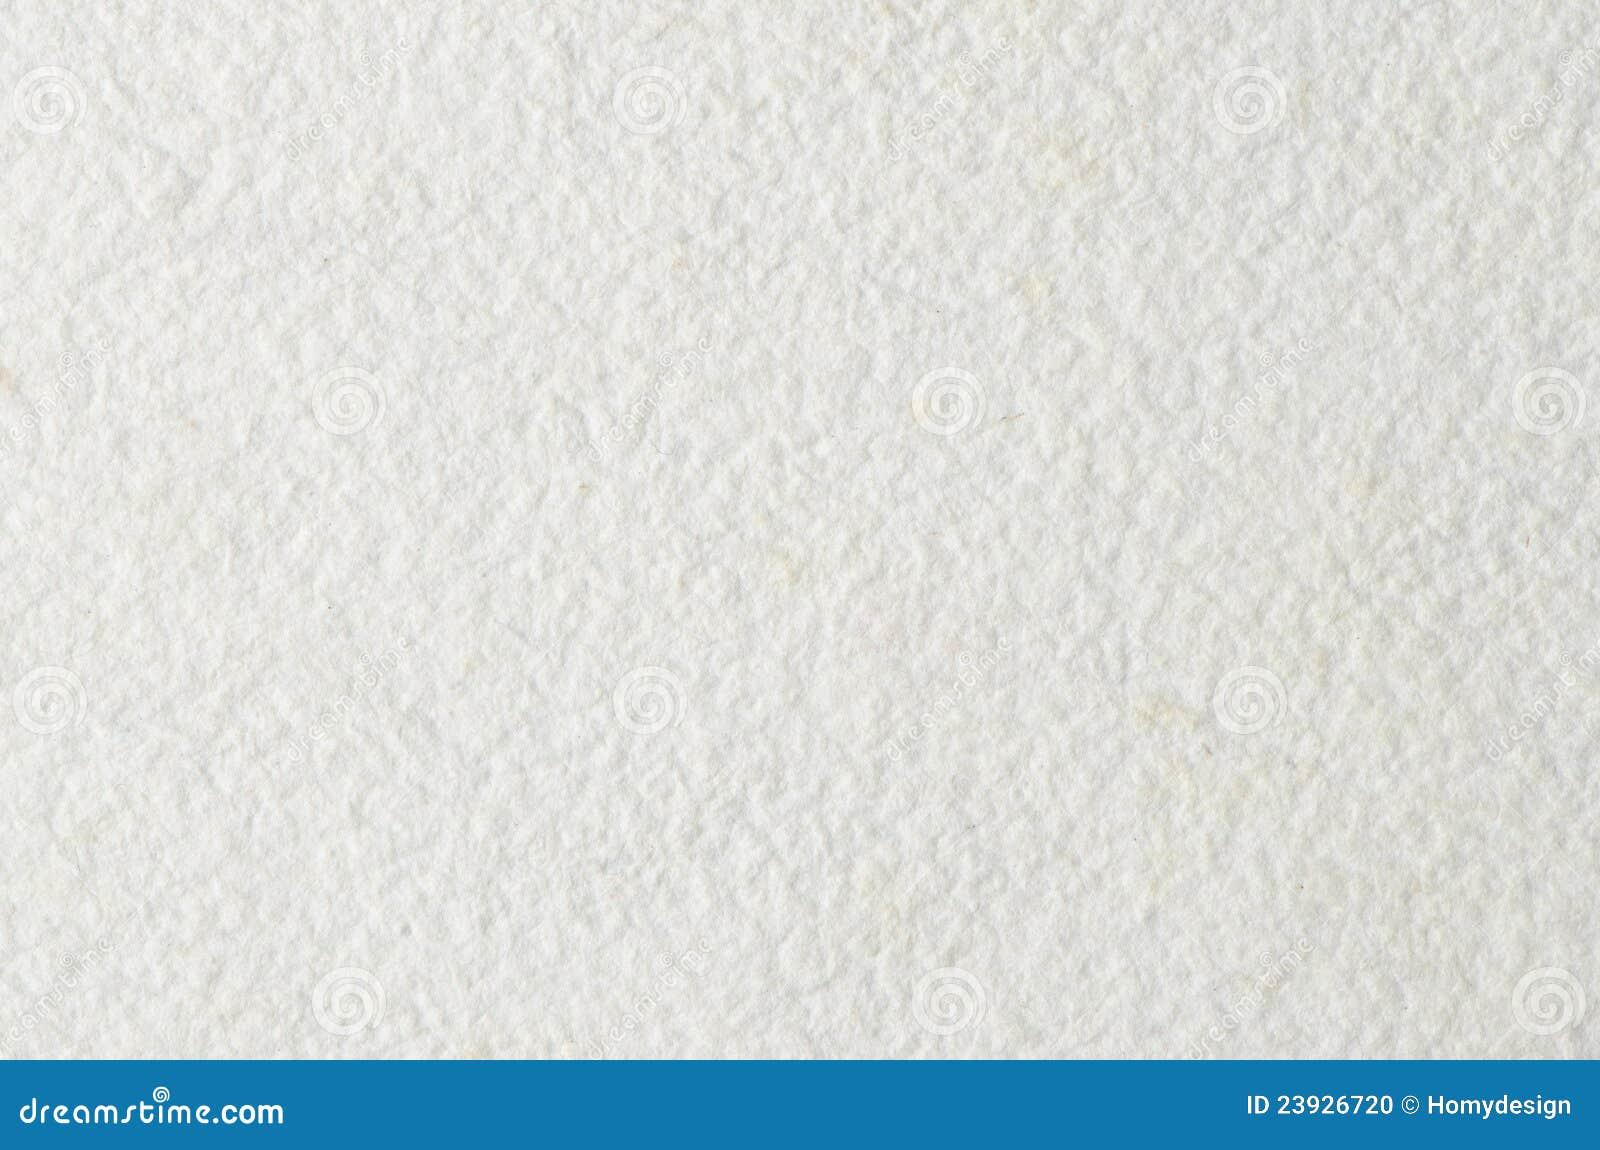 Cream Textured Paper Stock Photo Image 23926720